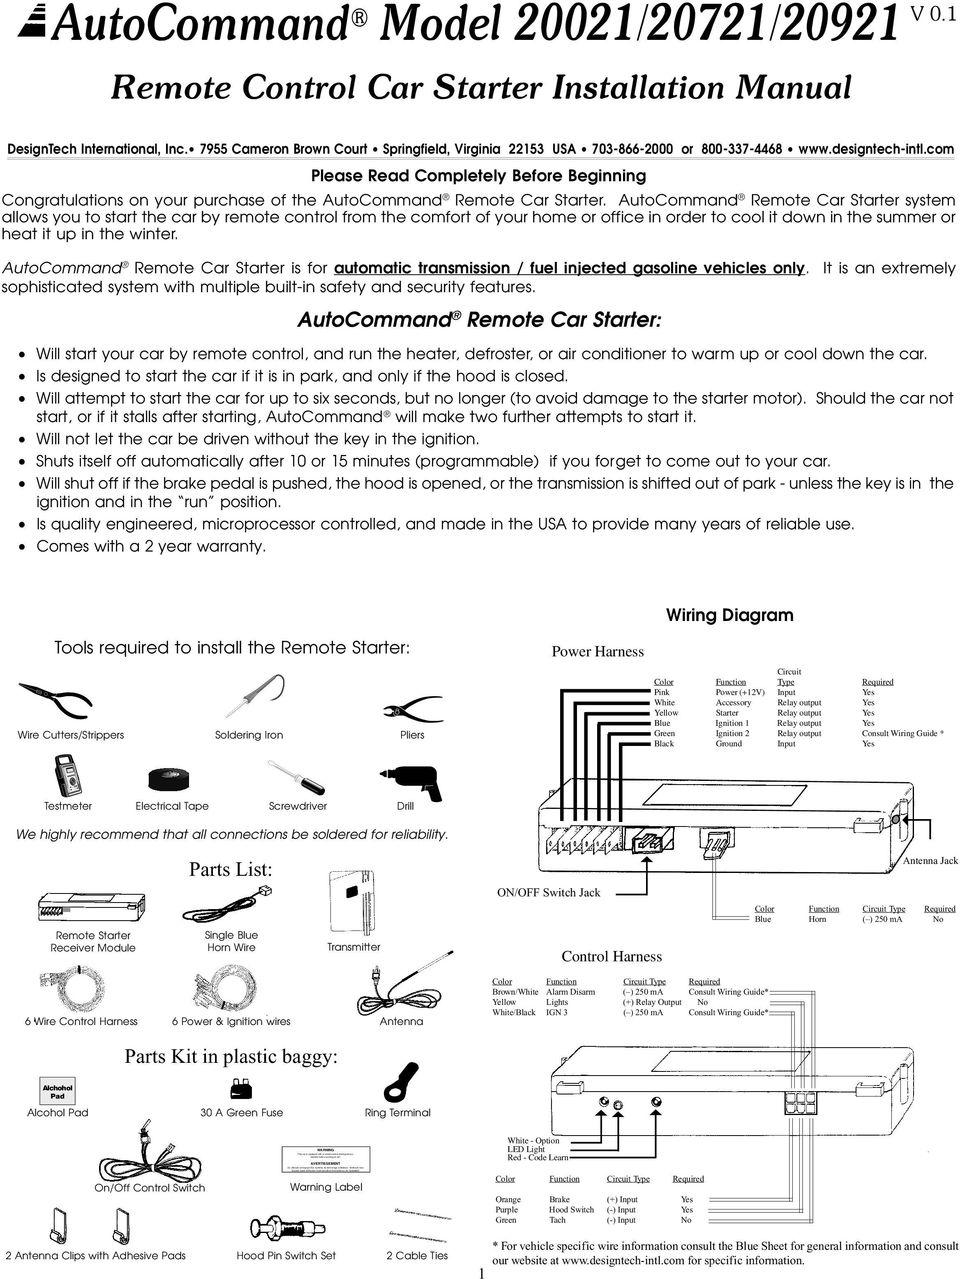 medium resolution of 1 remote control car starter installation manual designtech international inc 7955 cameron brown court